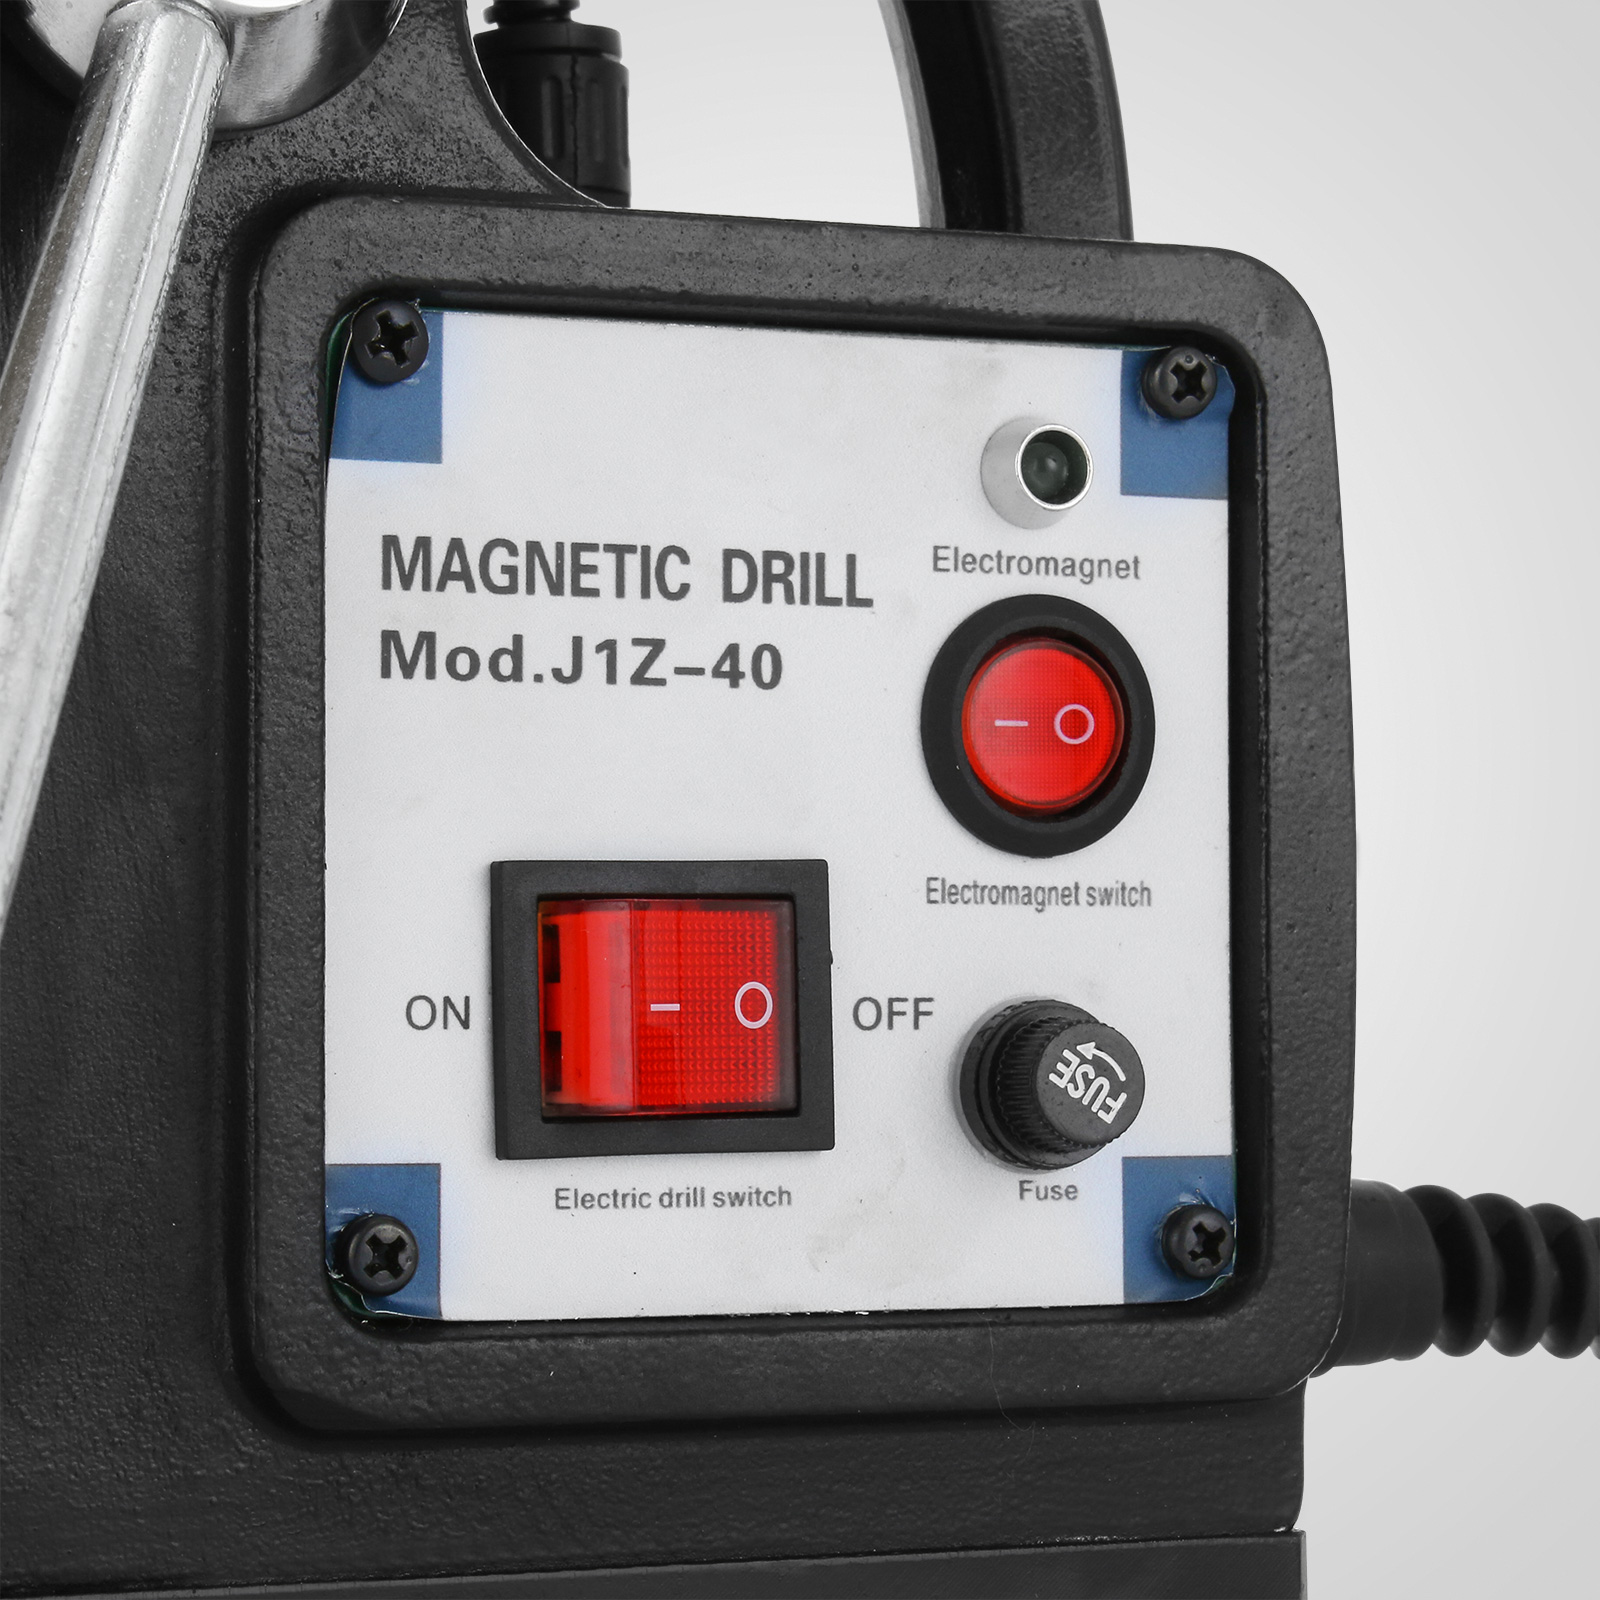 MB23-BRM35-MD40-Trapano-Perforatrice-Carotatore-Fresa-Magnetico-12-40mm-230V miniatura 33